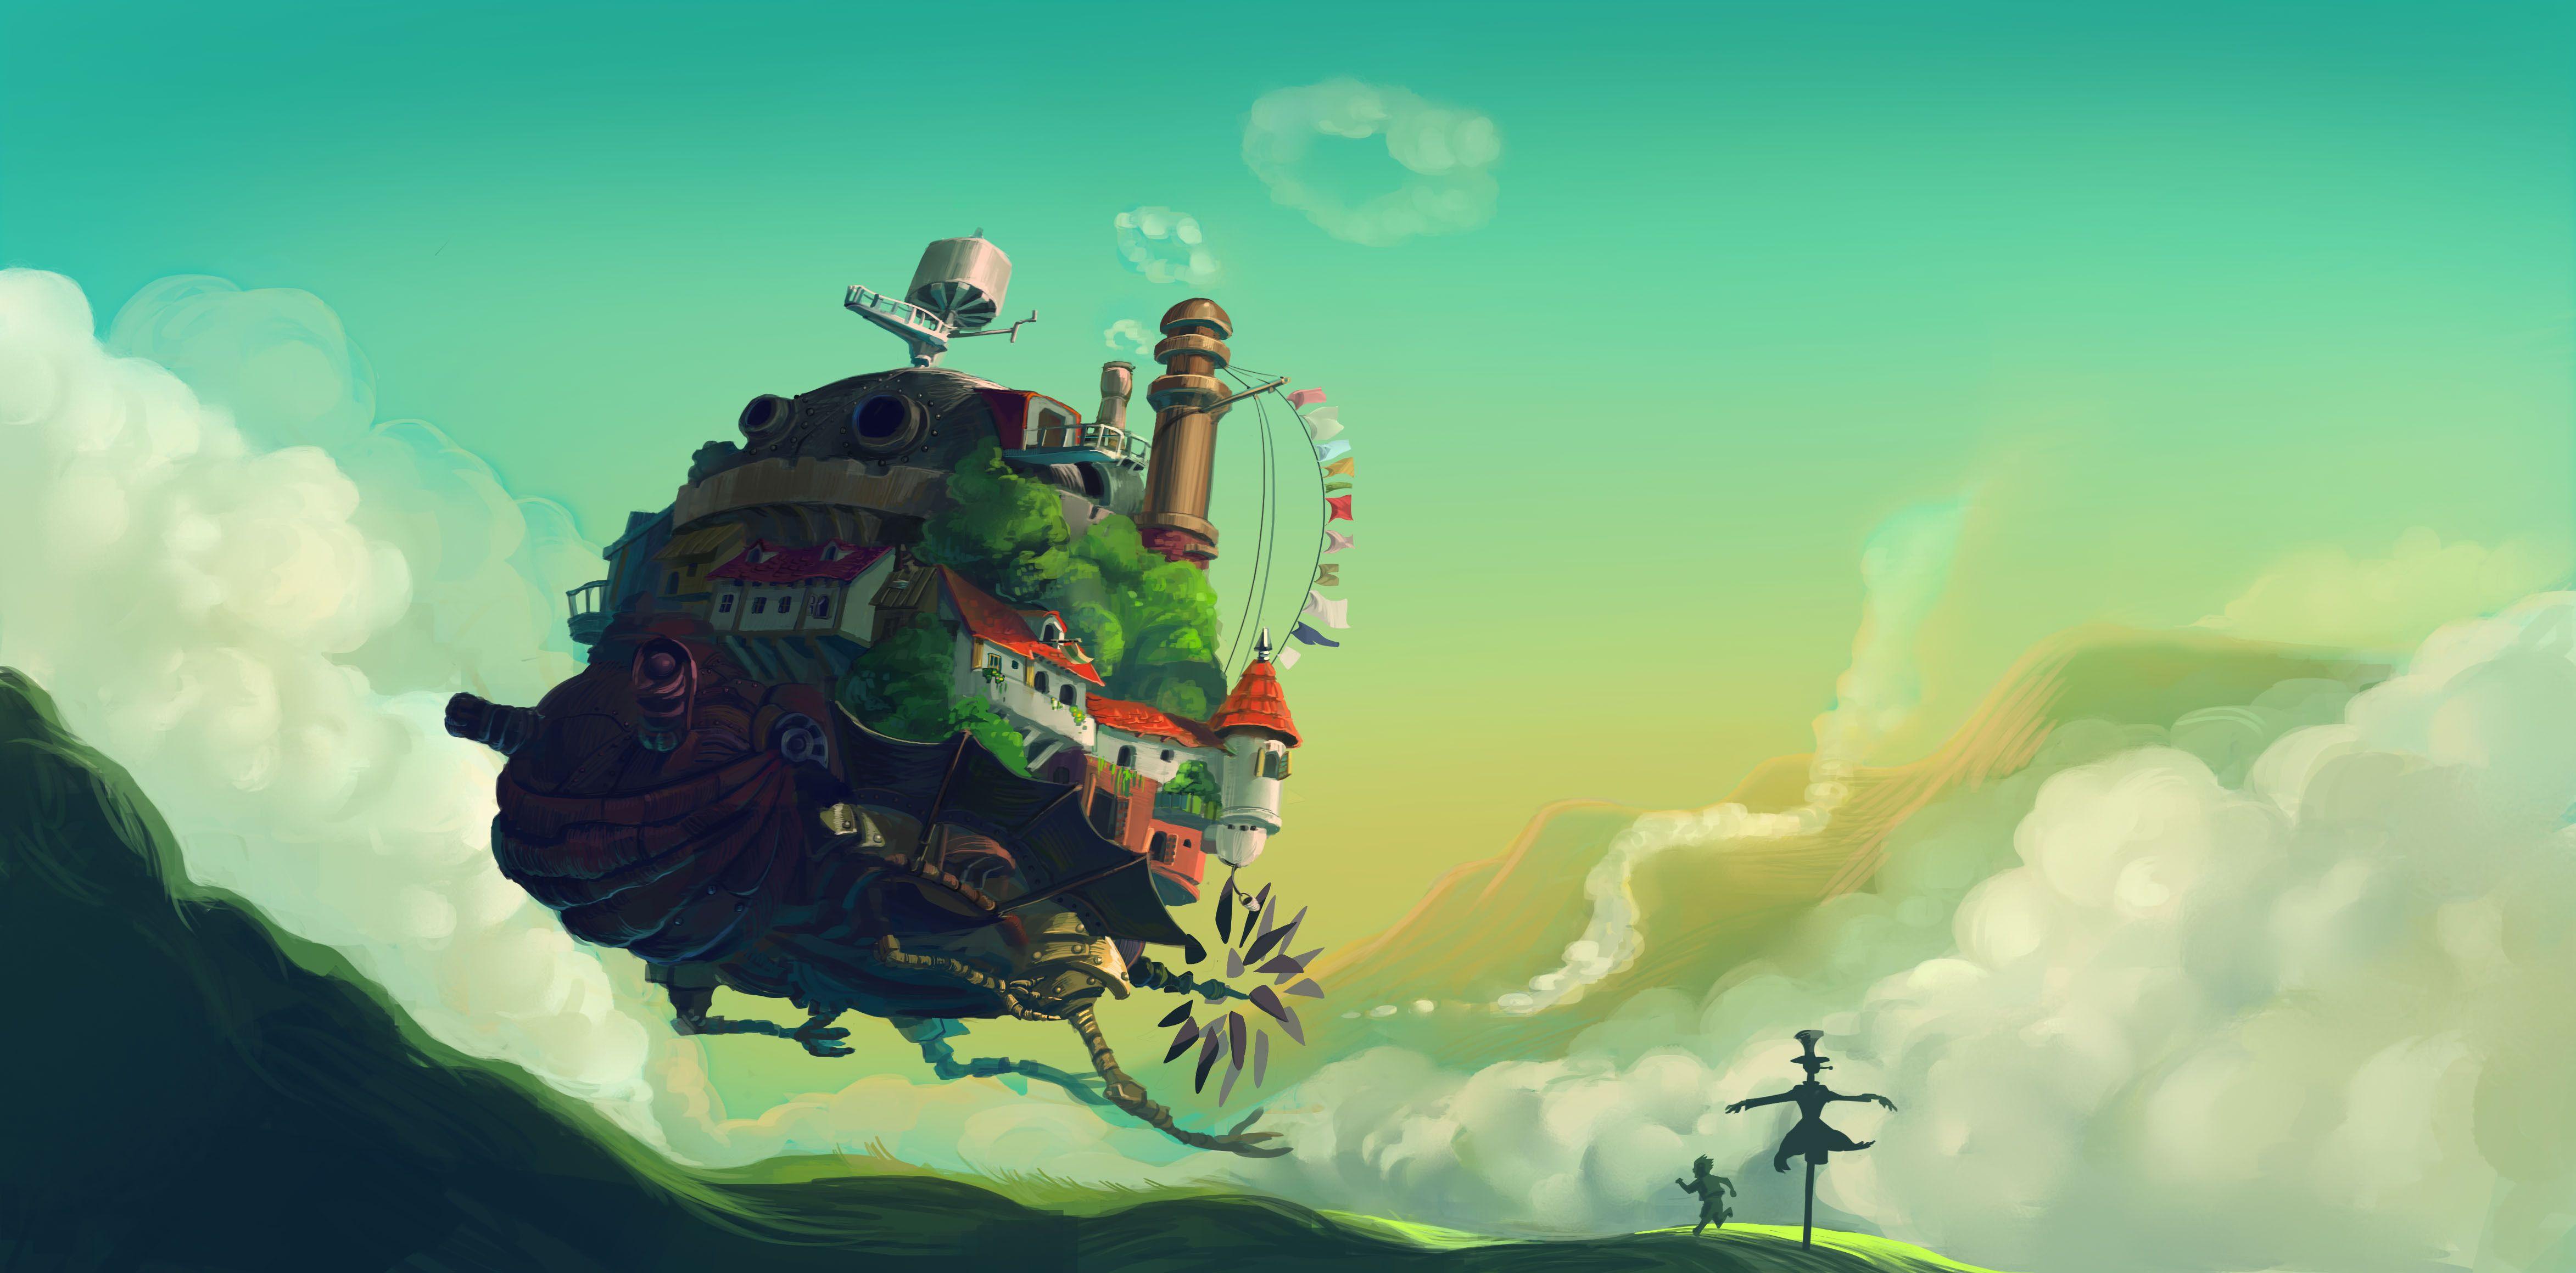 Howl's Moving Castle Howls moving castle art, Howls